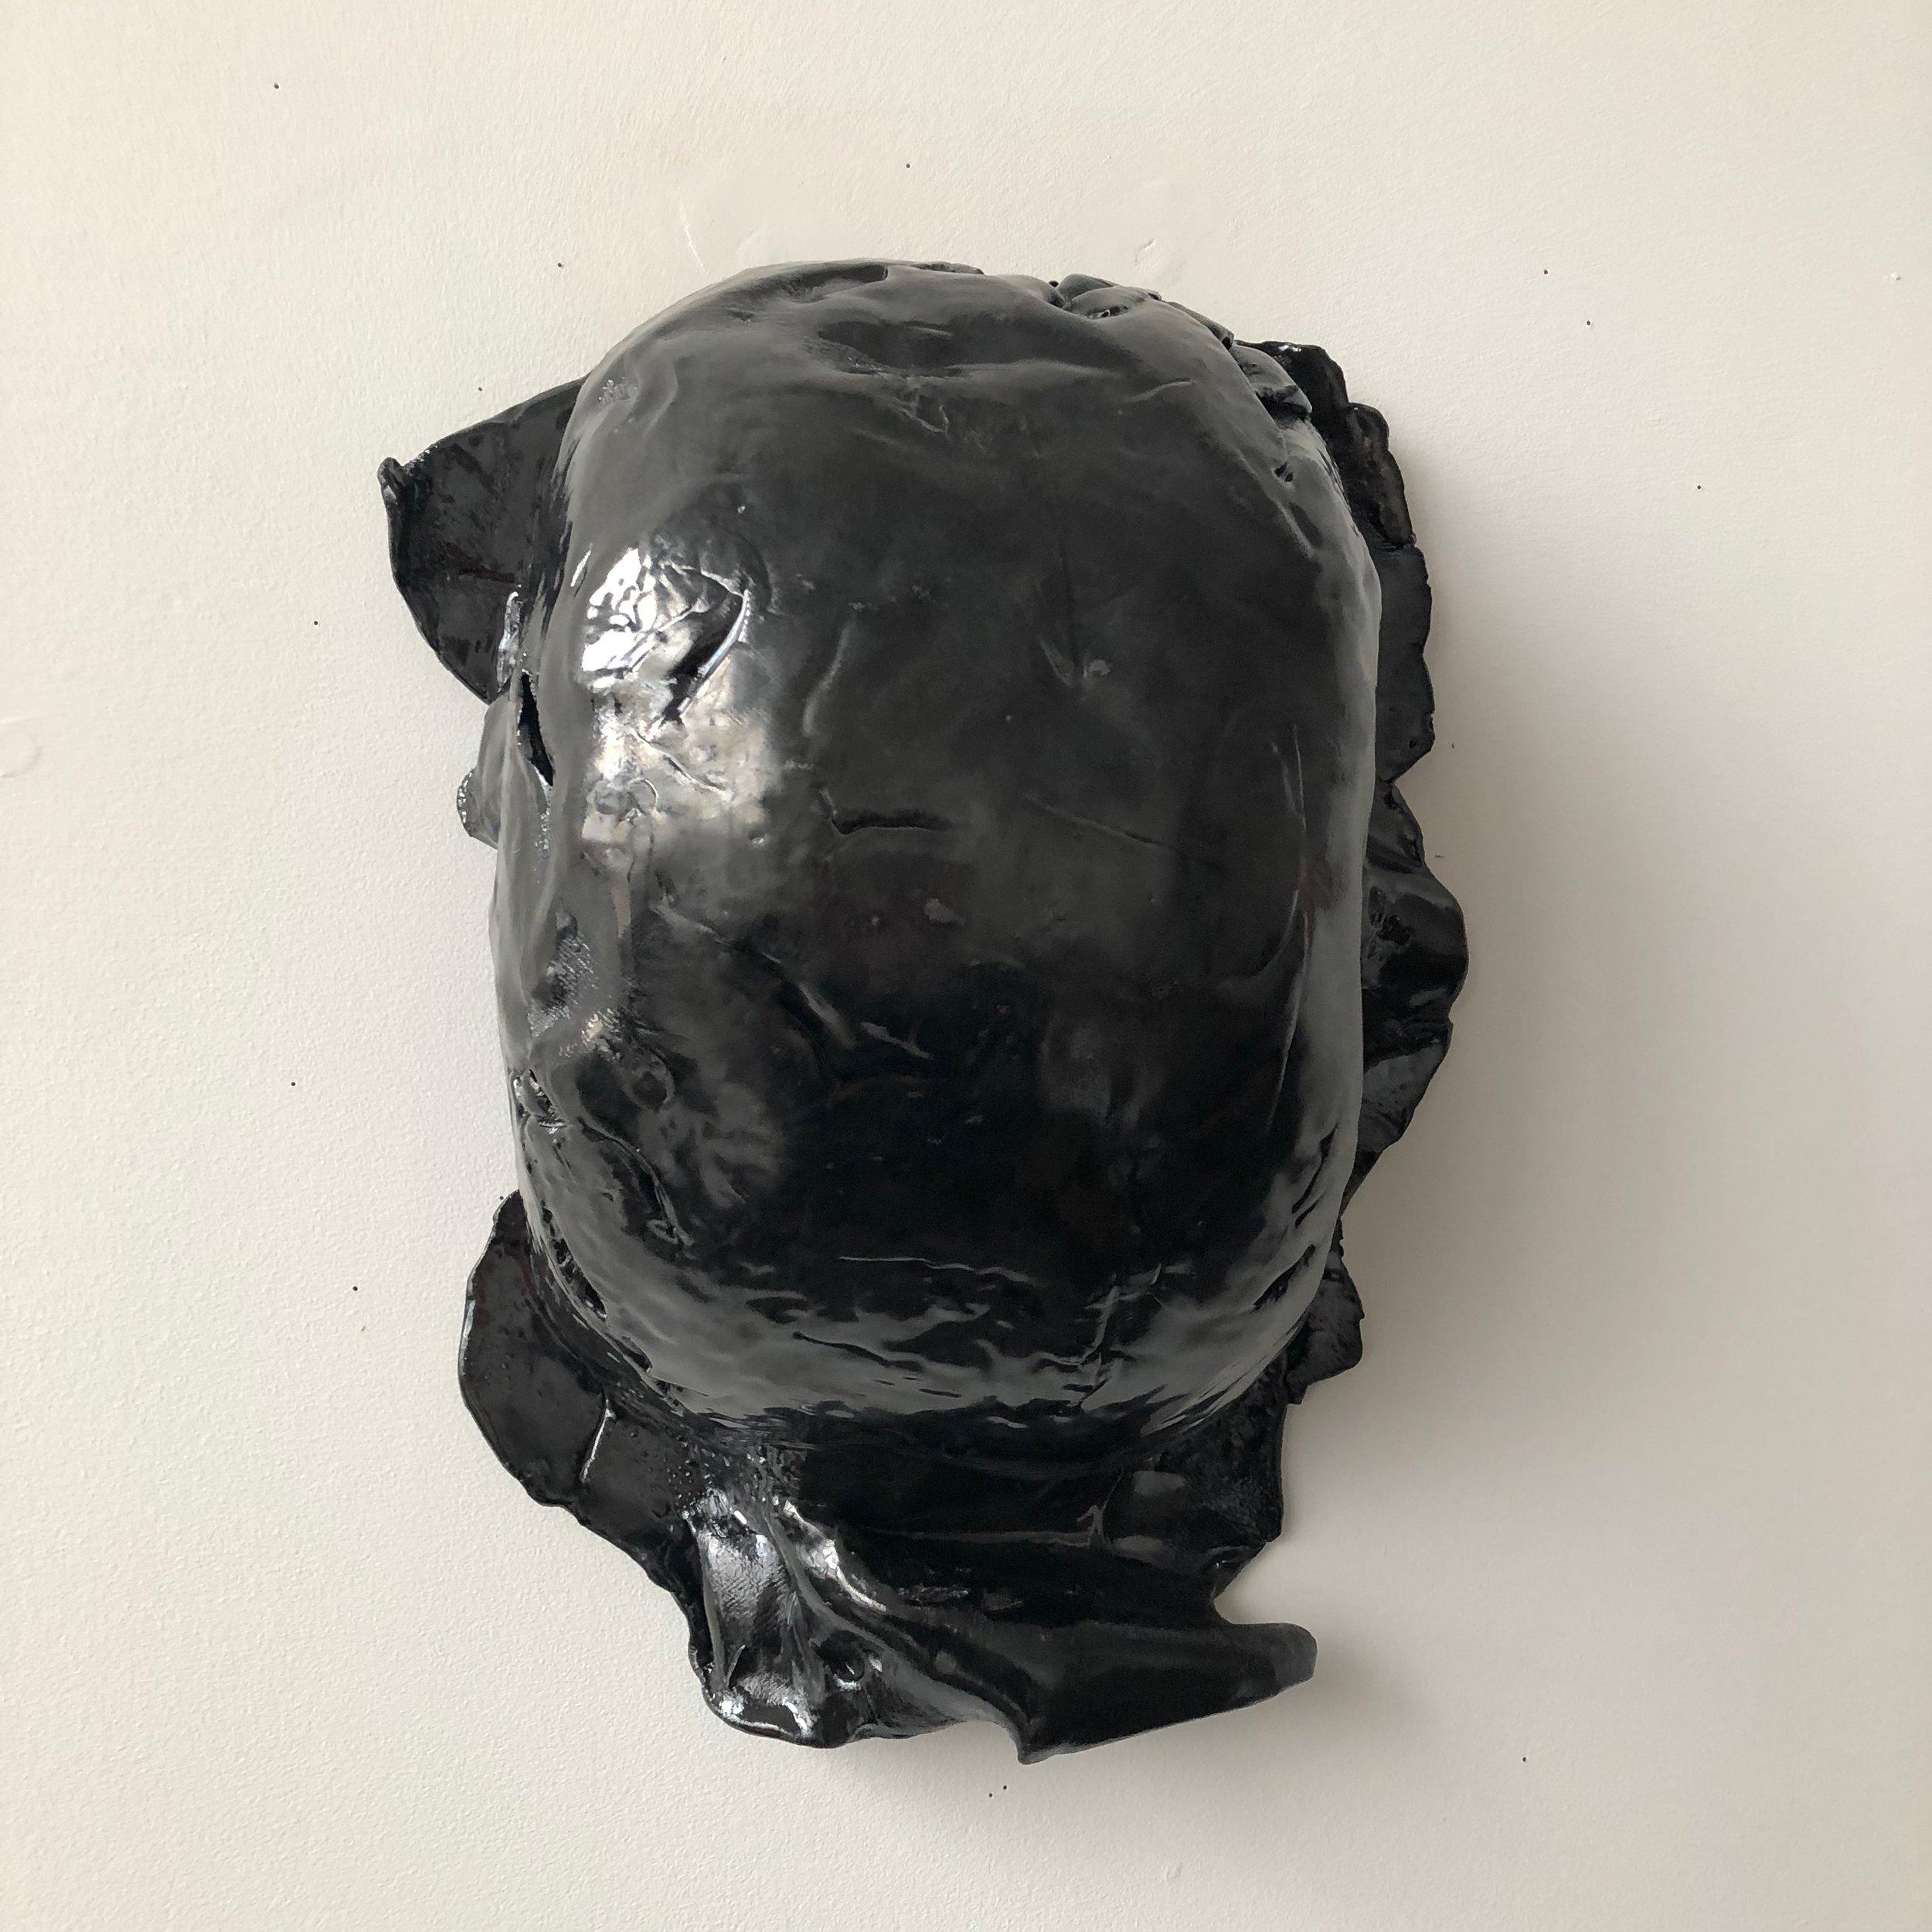 Untitled Belly Bag, 2019, glazed ceramic, 16 x 12 x 6 inches